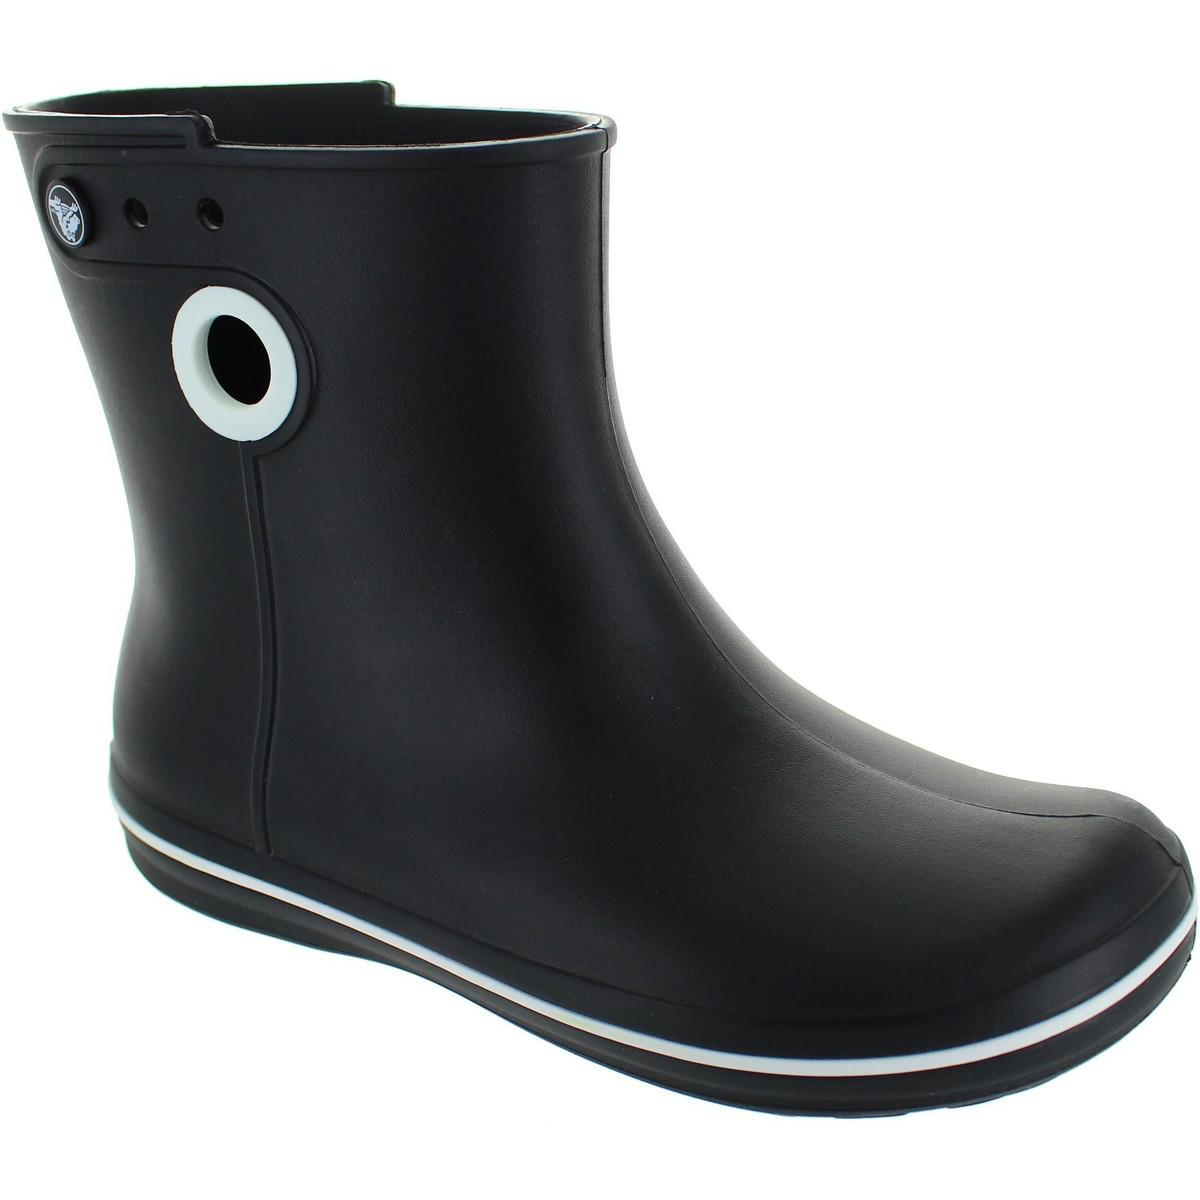 d85ad30d0 Crocs™ Jaunt Shorty Boot Women s Wellington Boots In Black in Black ...